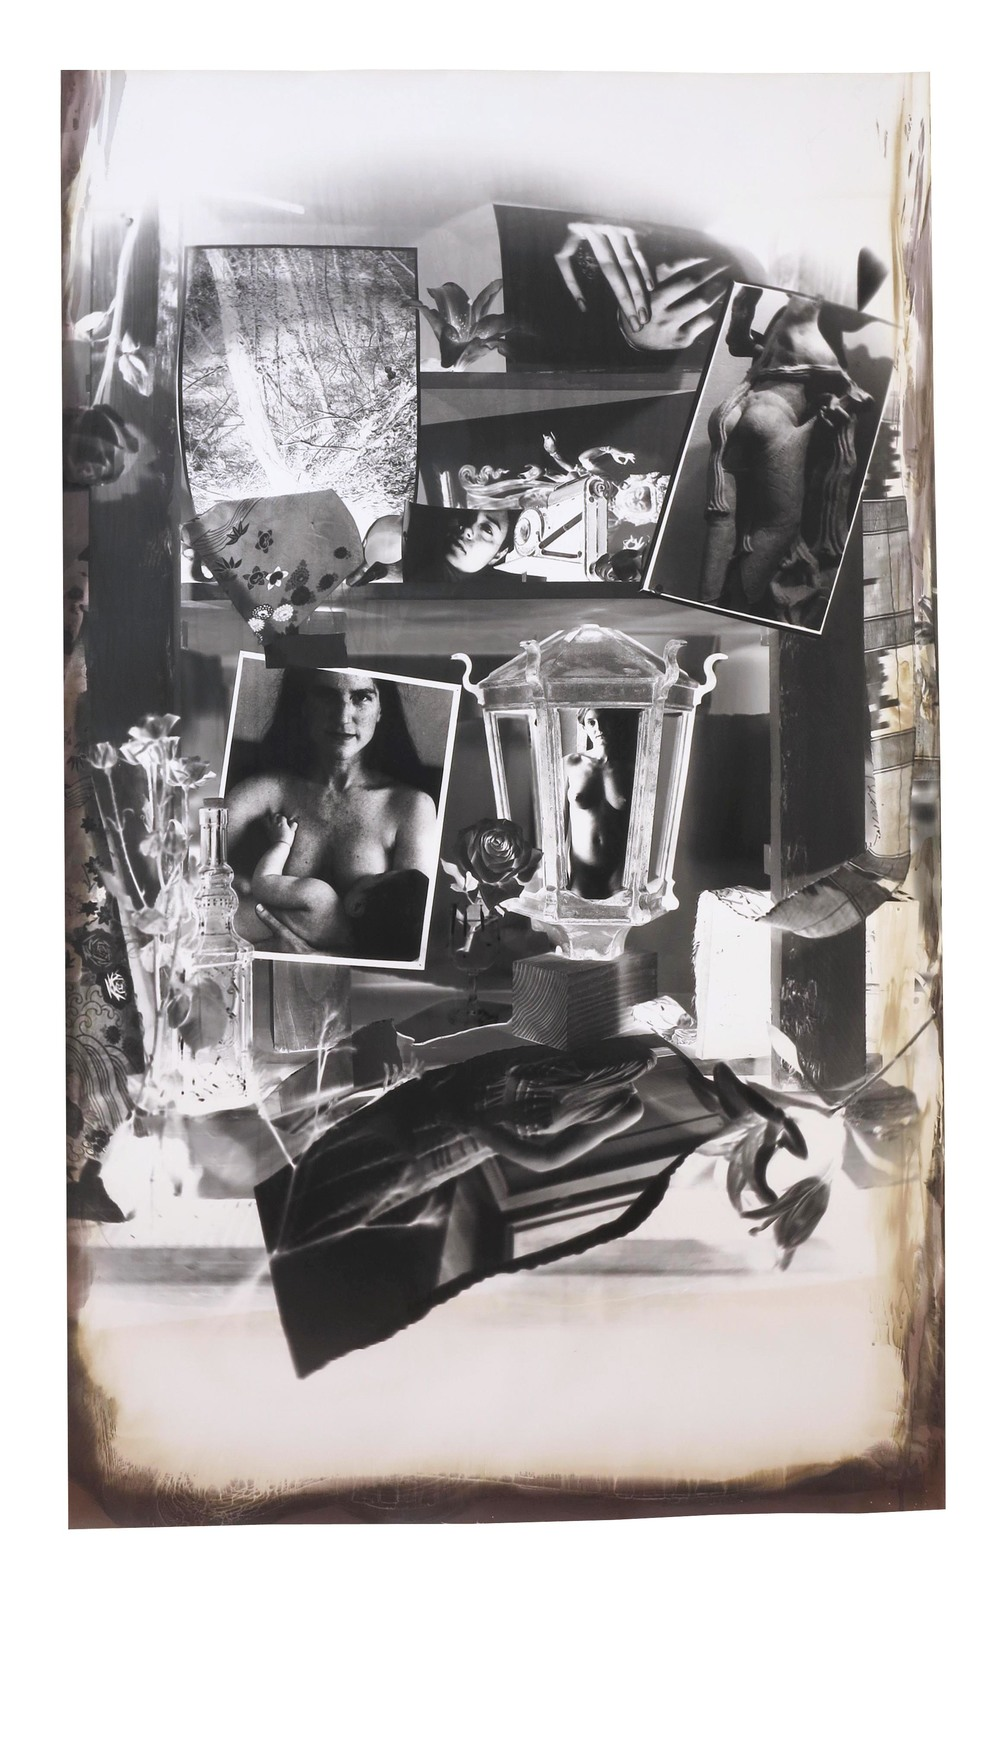 Ruth, Baby, Saskia, et al.  2004  gelatin silver print  69 x 41 inches